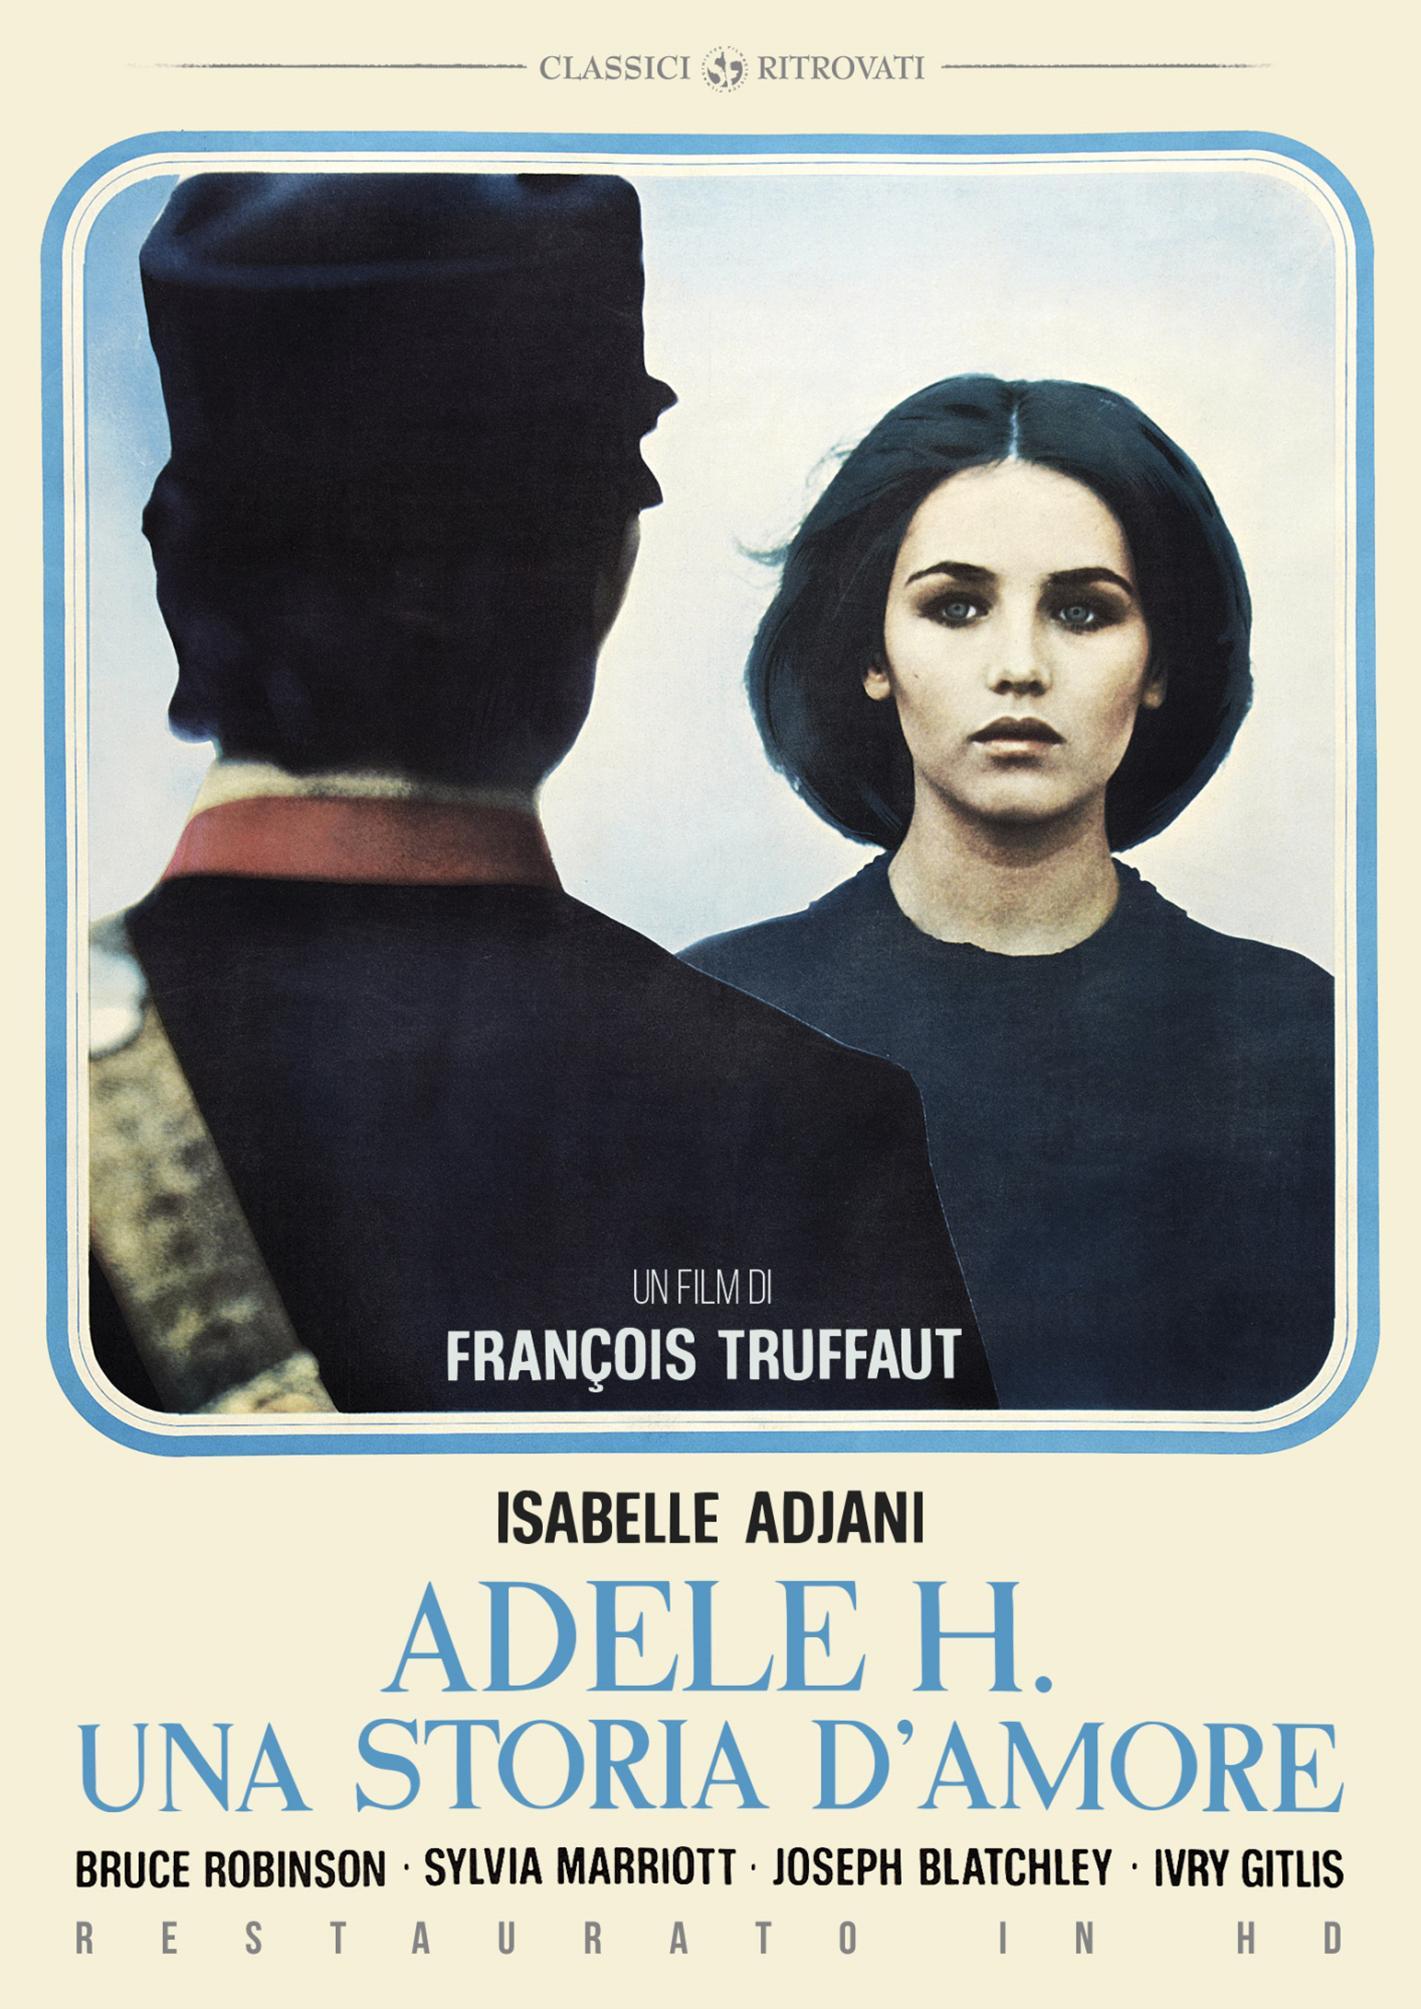 ADELE H., UNA STORIA D'AMORE (RESTAURATO IN HD) (DVD)